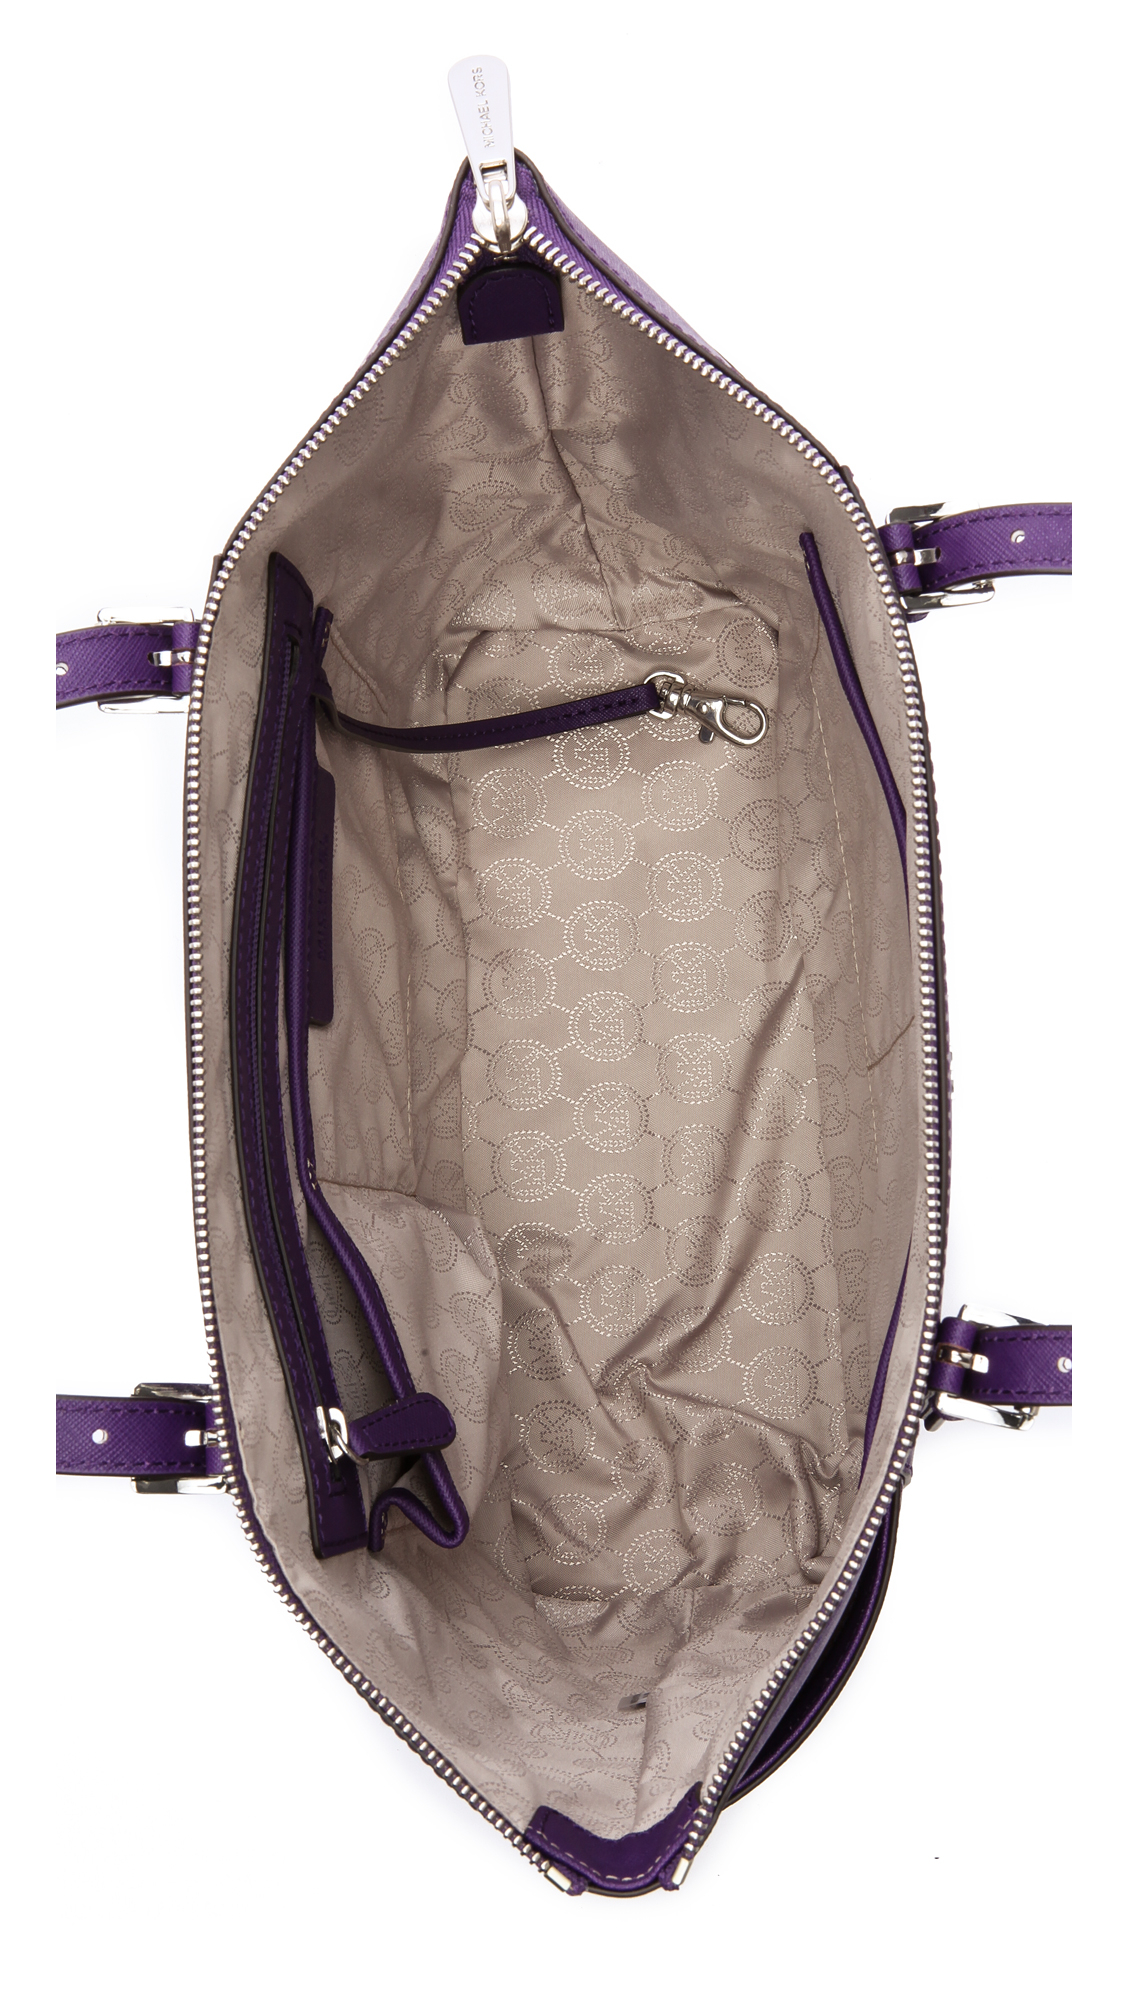 lyst michael michael kors jet set tote grape in purple. Black Bedroom Furniture Sets. Home Design Ideas